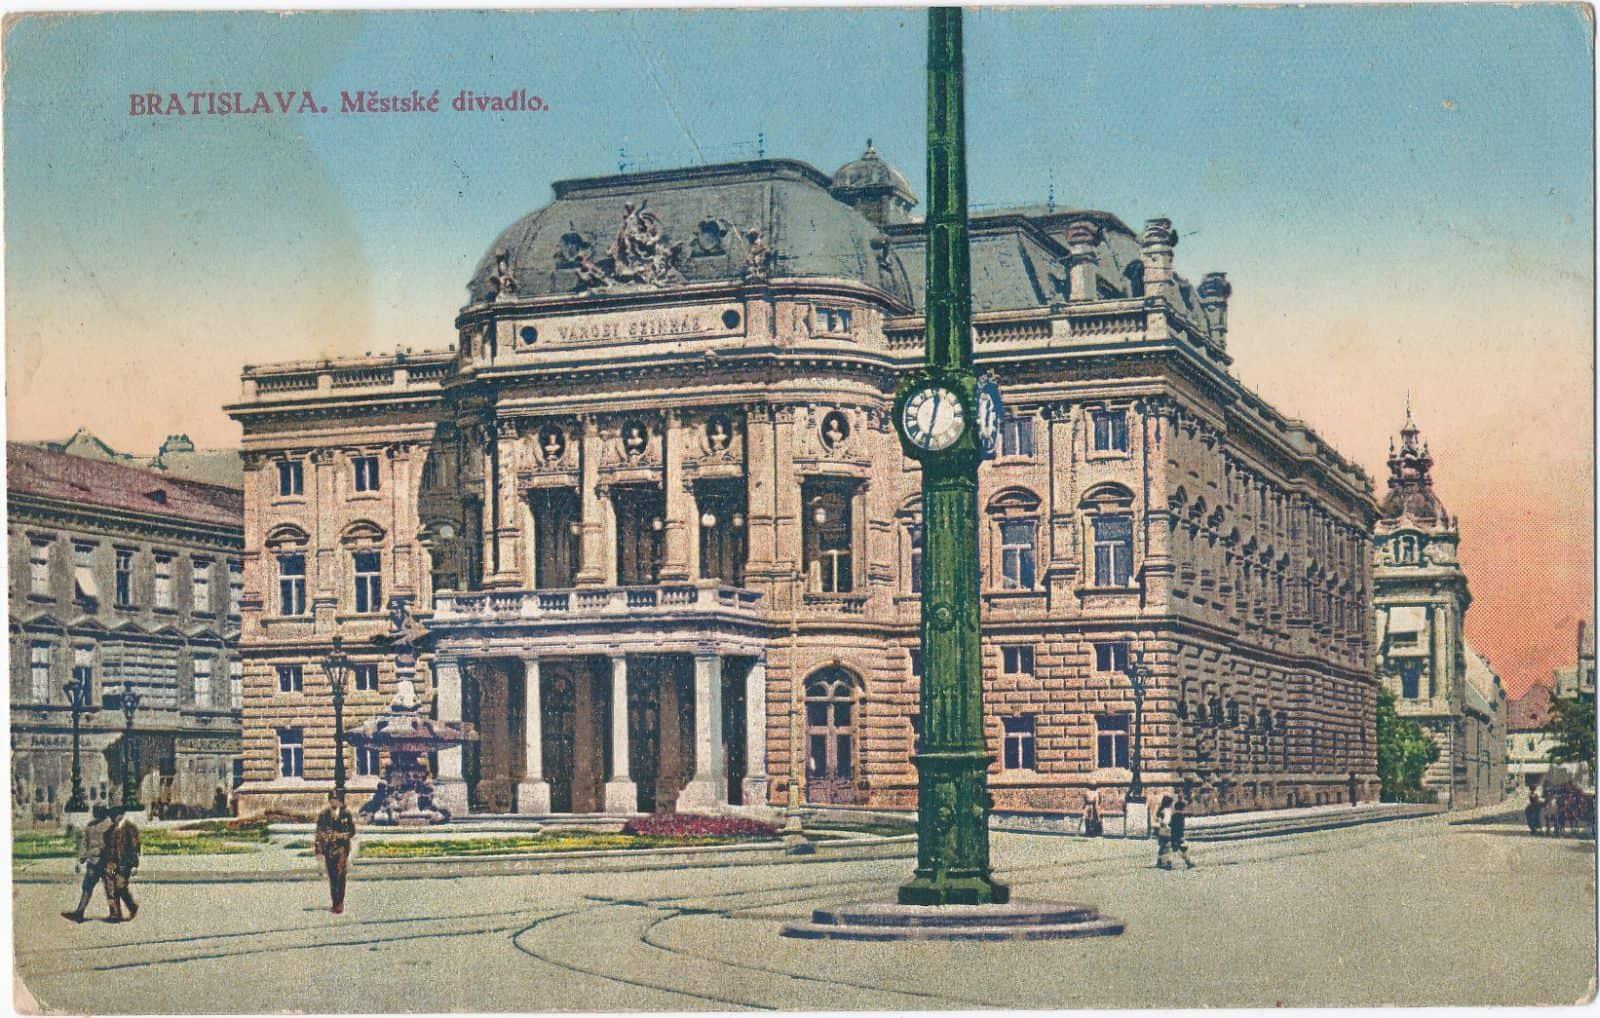 Autor: 1926, Bratislava historické fotografie / Kronika Slovenskej republiky